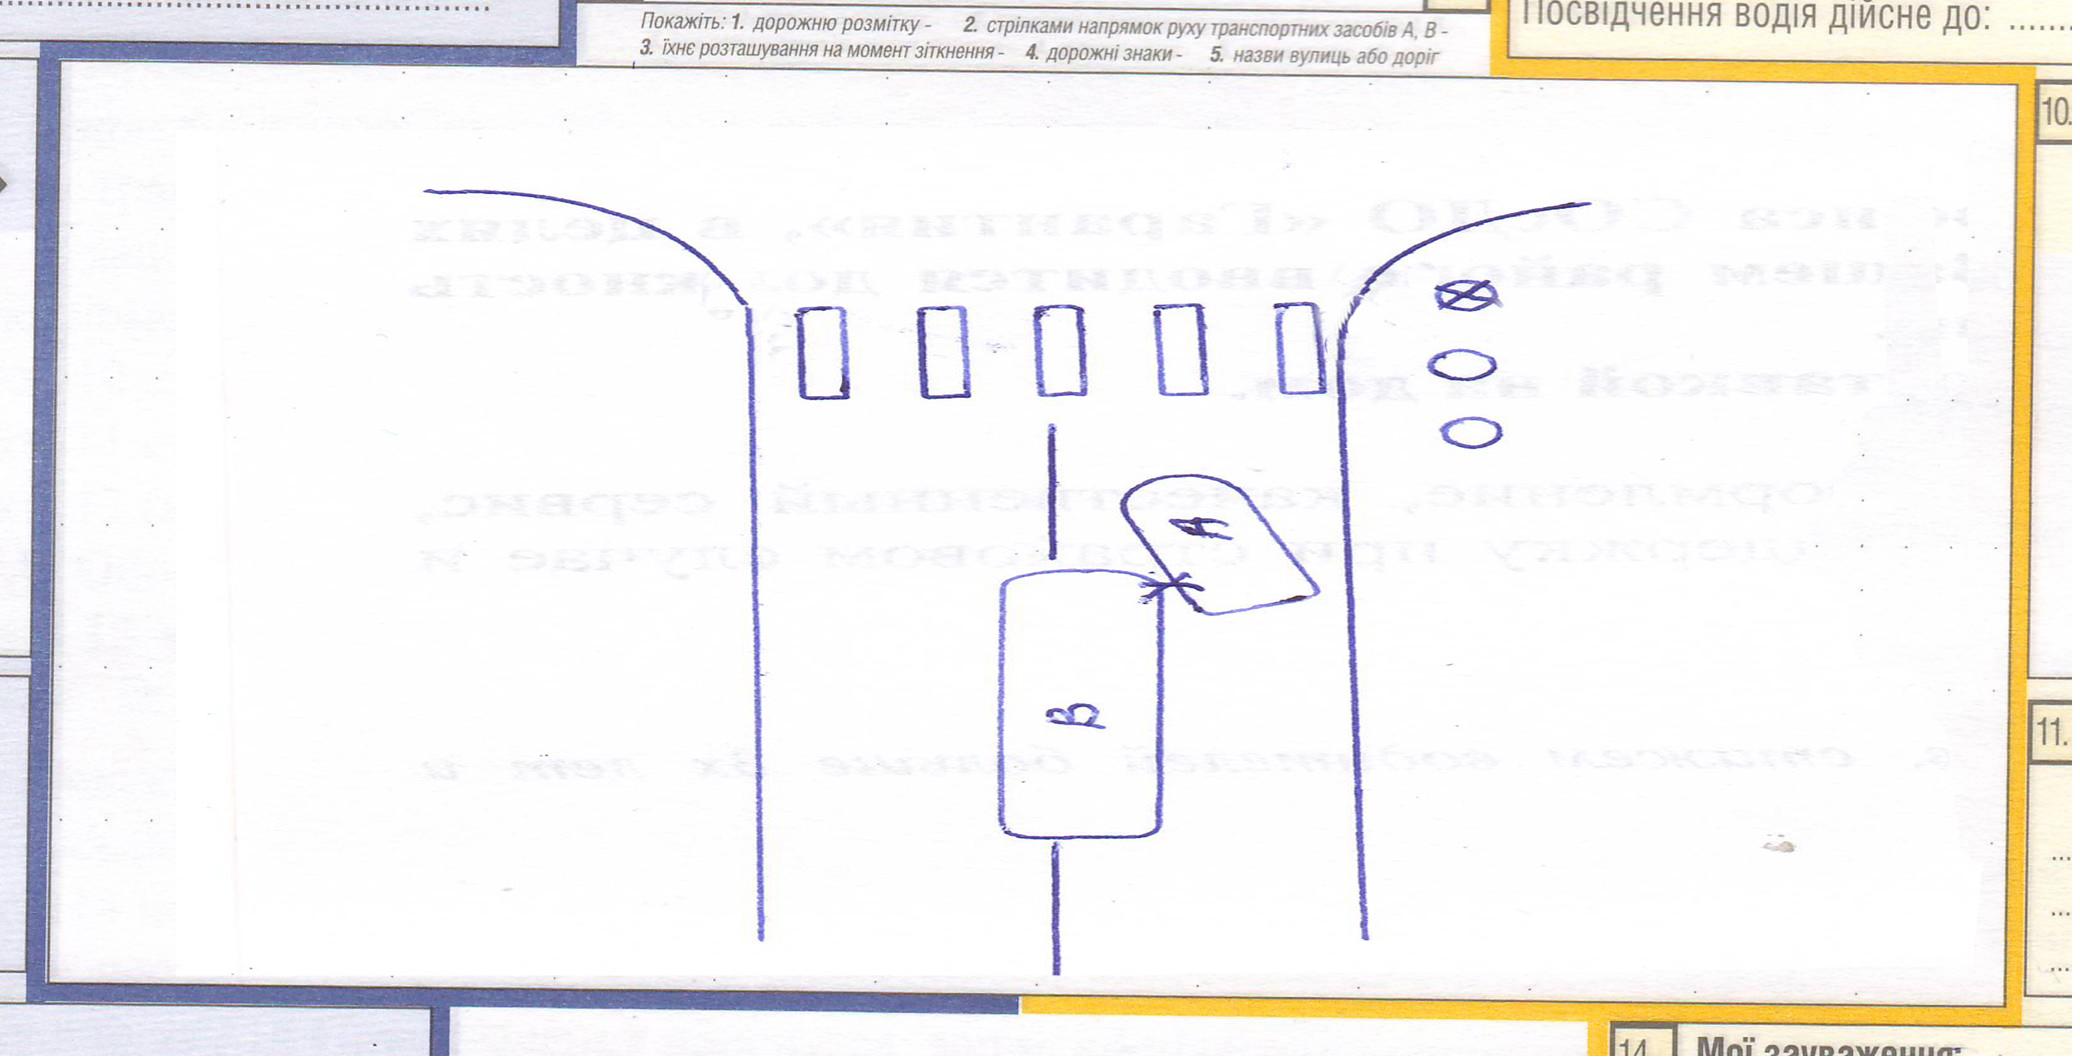 Схема дтп наезд на пешехода образец